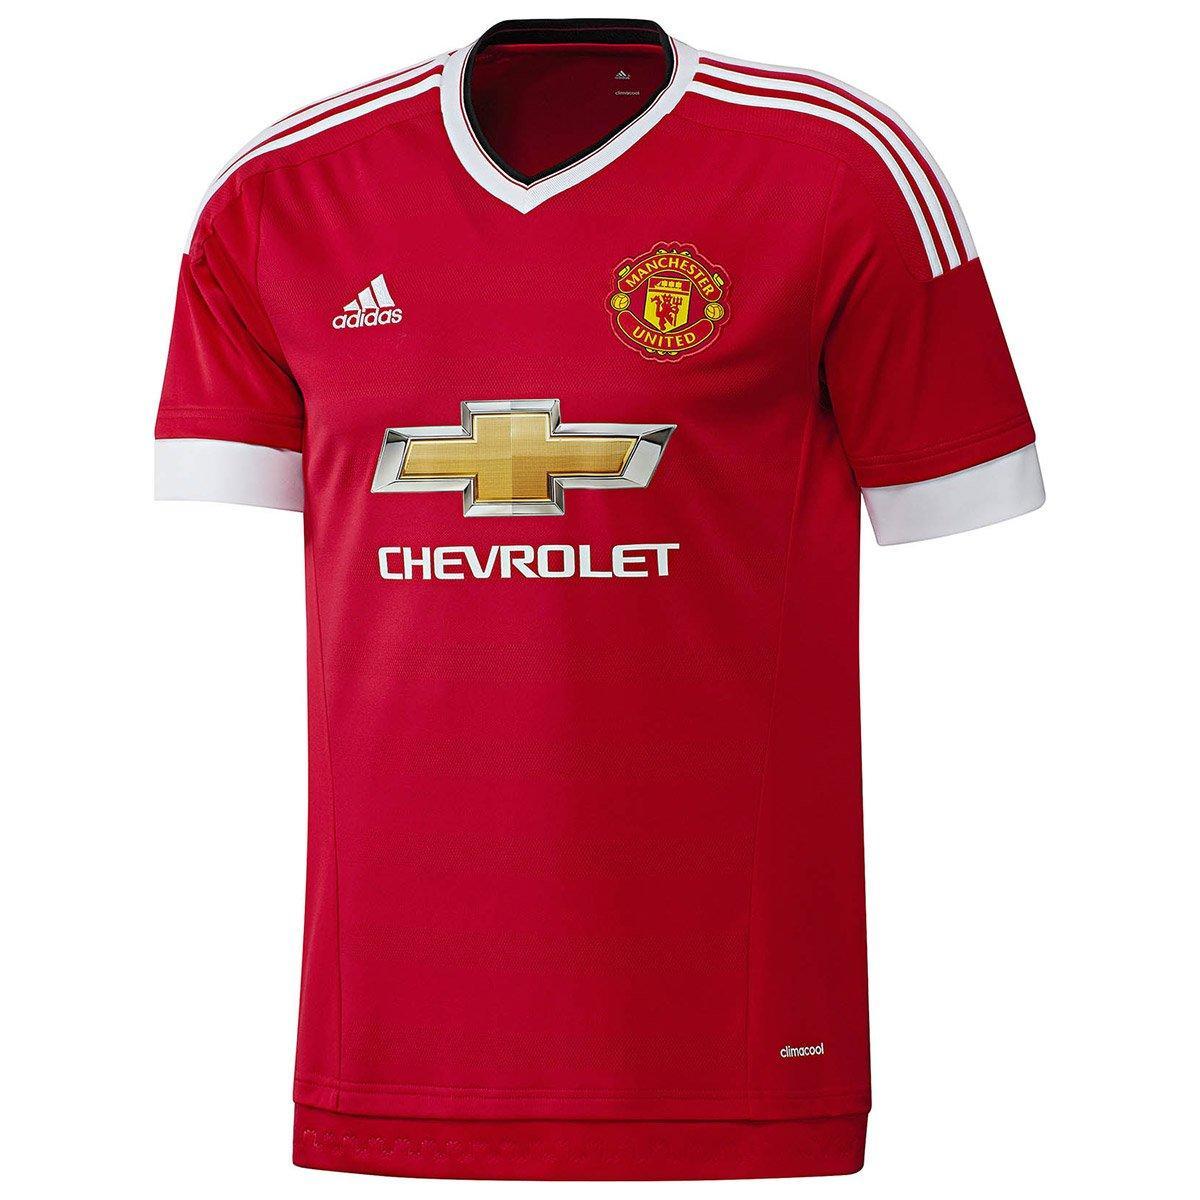 Prefijo Tipo delantero amor  Buy Adidas Manchester United Men's Home Jersey Online in India